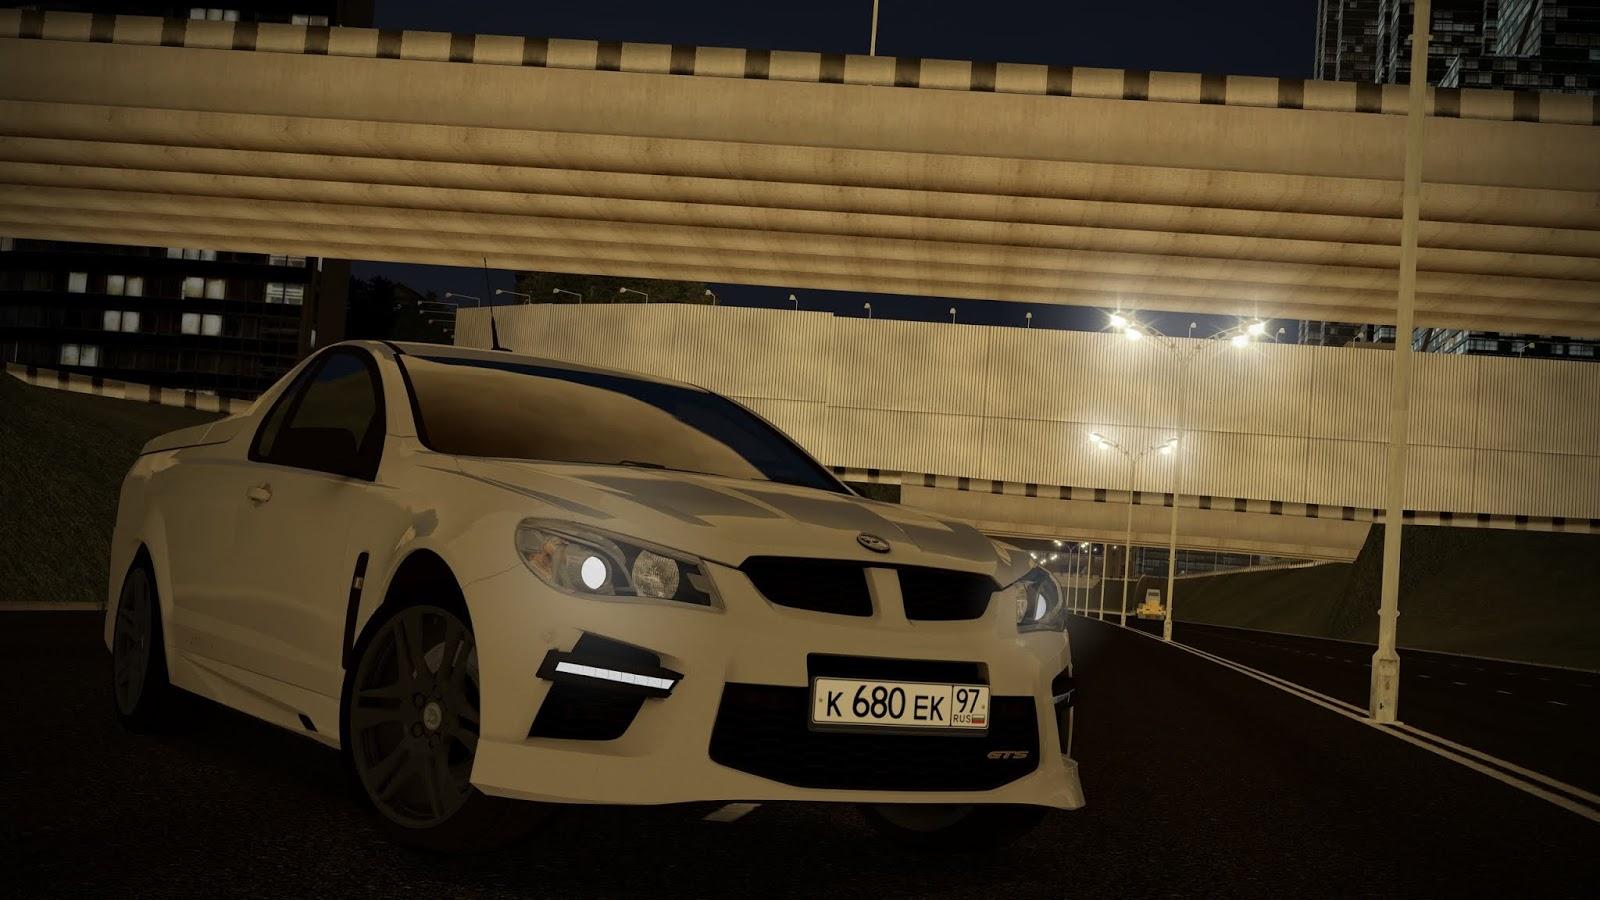 2014 Hsv Gts Maloo City Car Driving 1 5 7 Mod